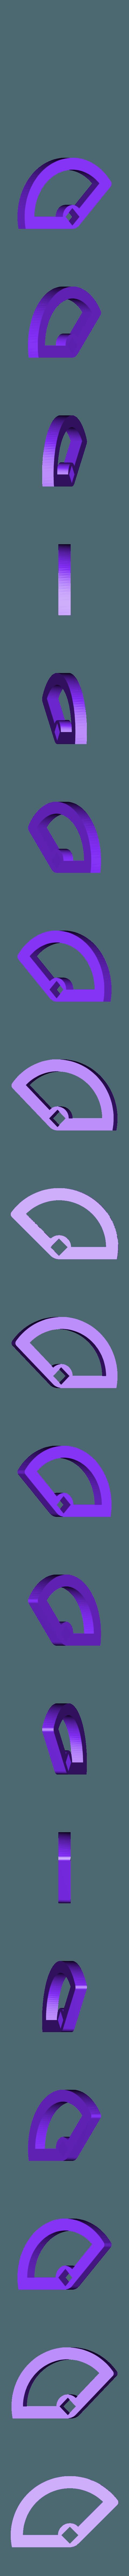 Cam_Ring.stl Download free STL file Impatience, Motorized • 3D printer object, gzumwalt